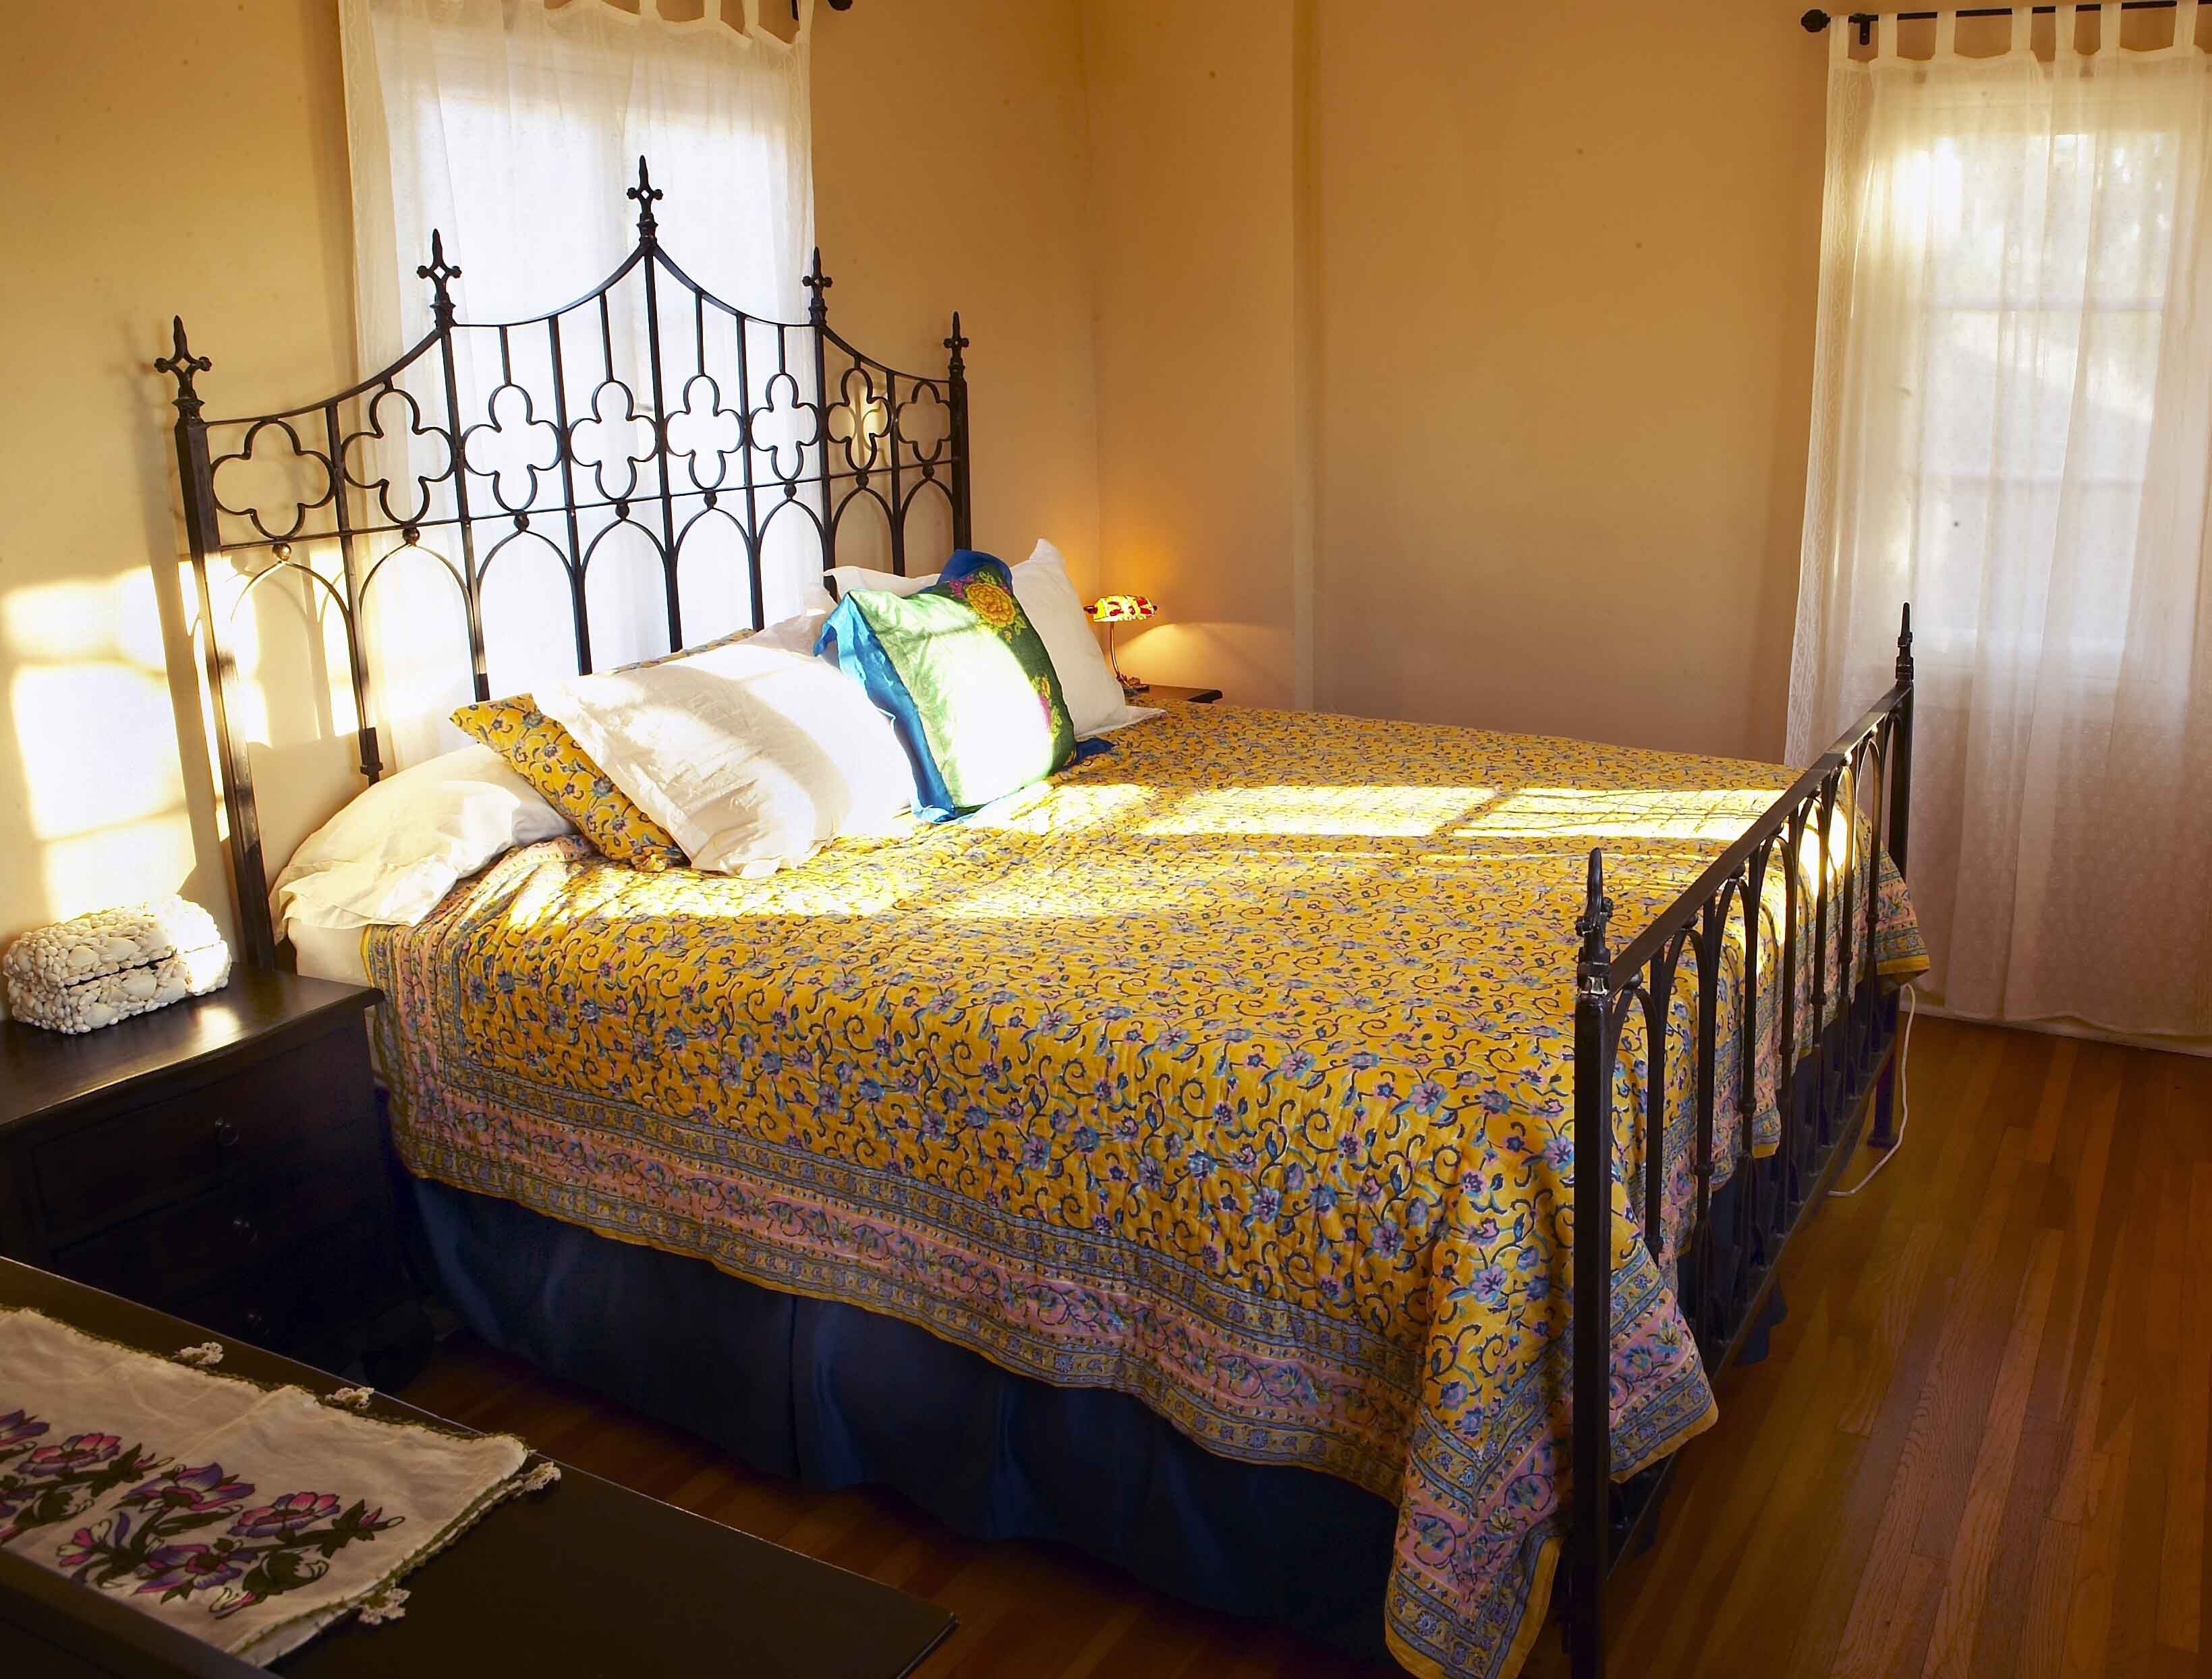 wrought_iron_gothic_bed_.JPG 3,279×2,489 pixels | Home Decor | Pinterest